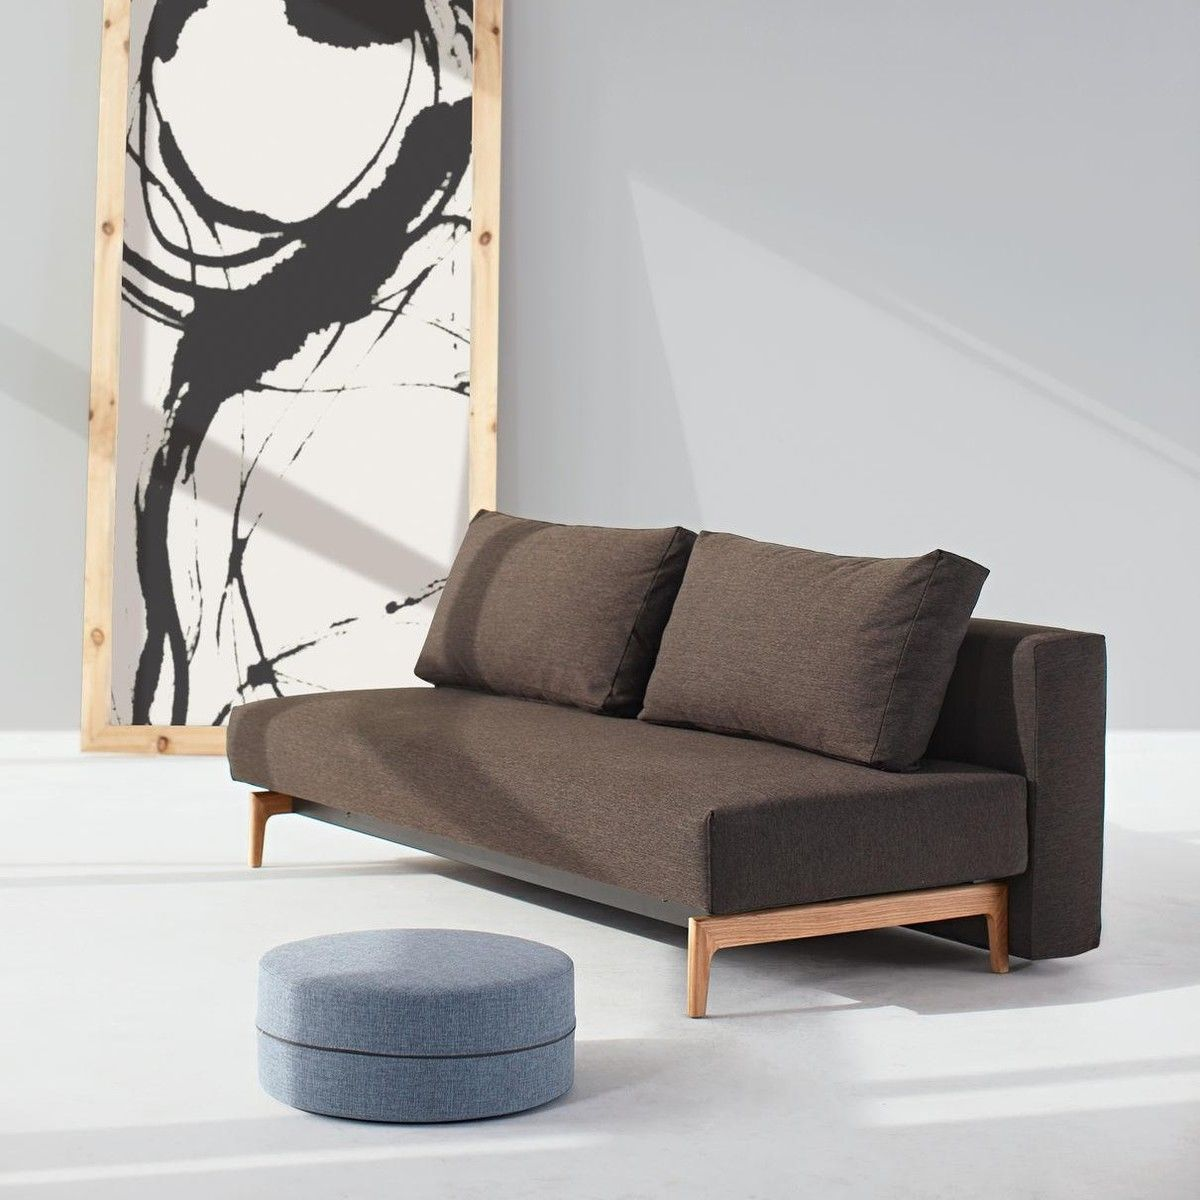 trym canap lit innovation. Black Bedroom Furniture Sets. Home Design Ideas